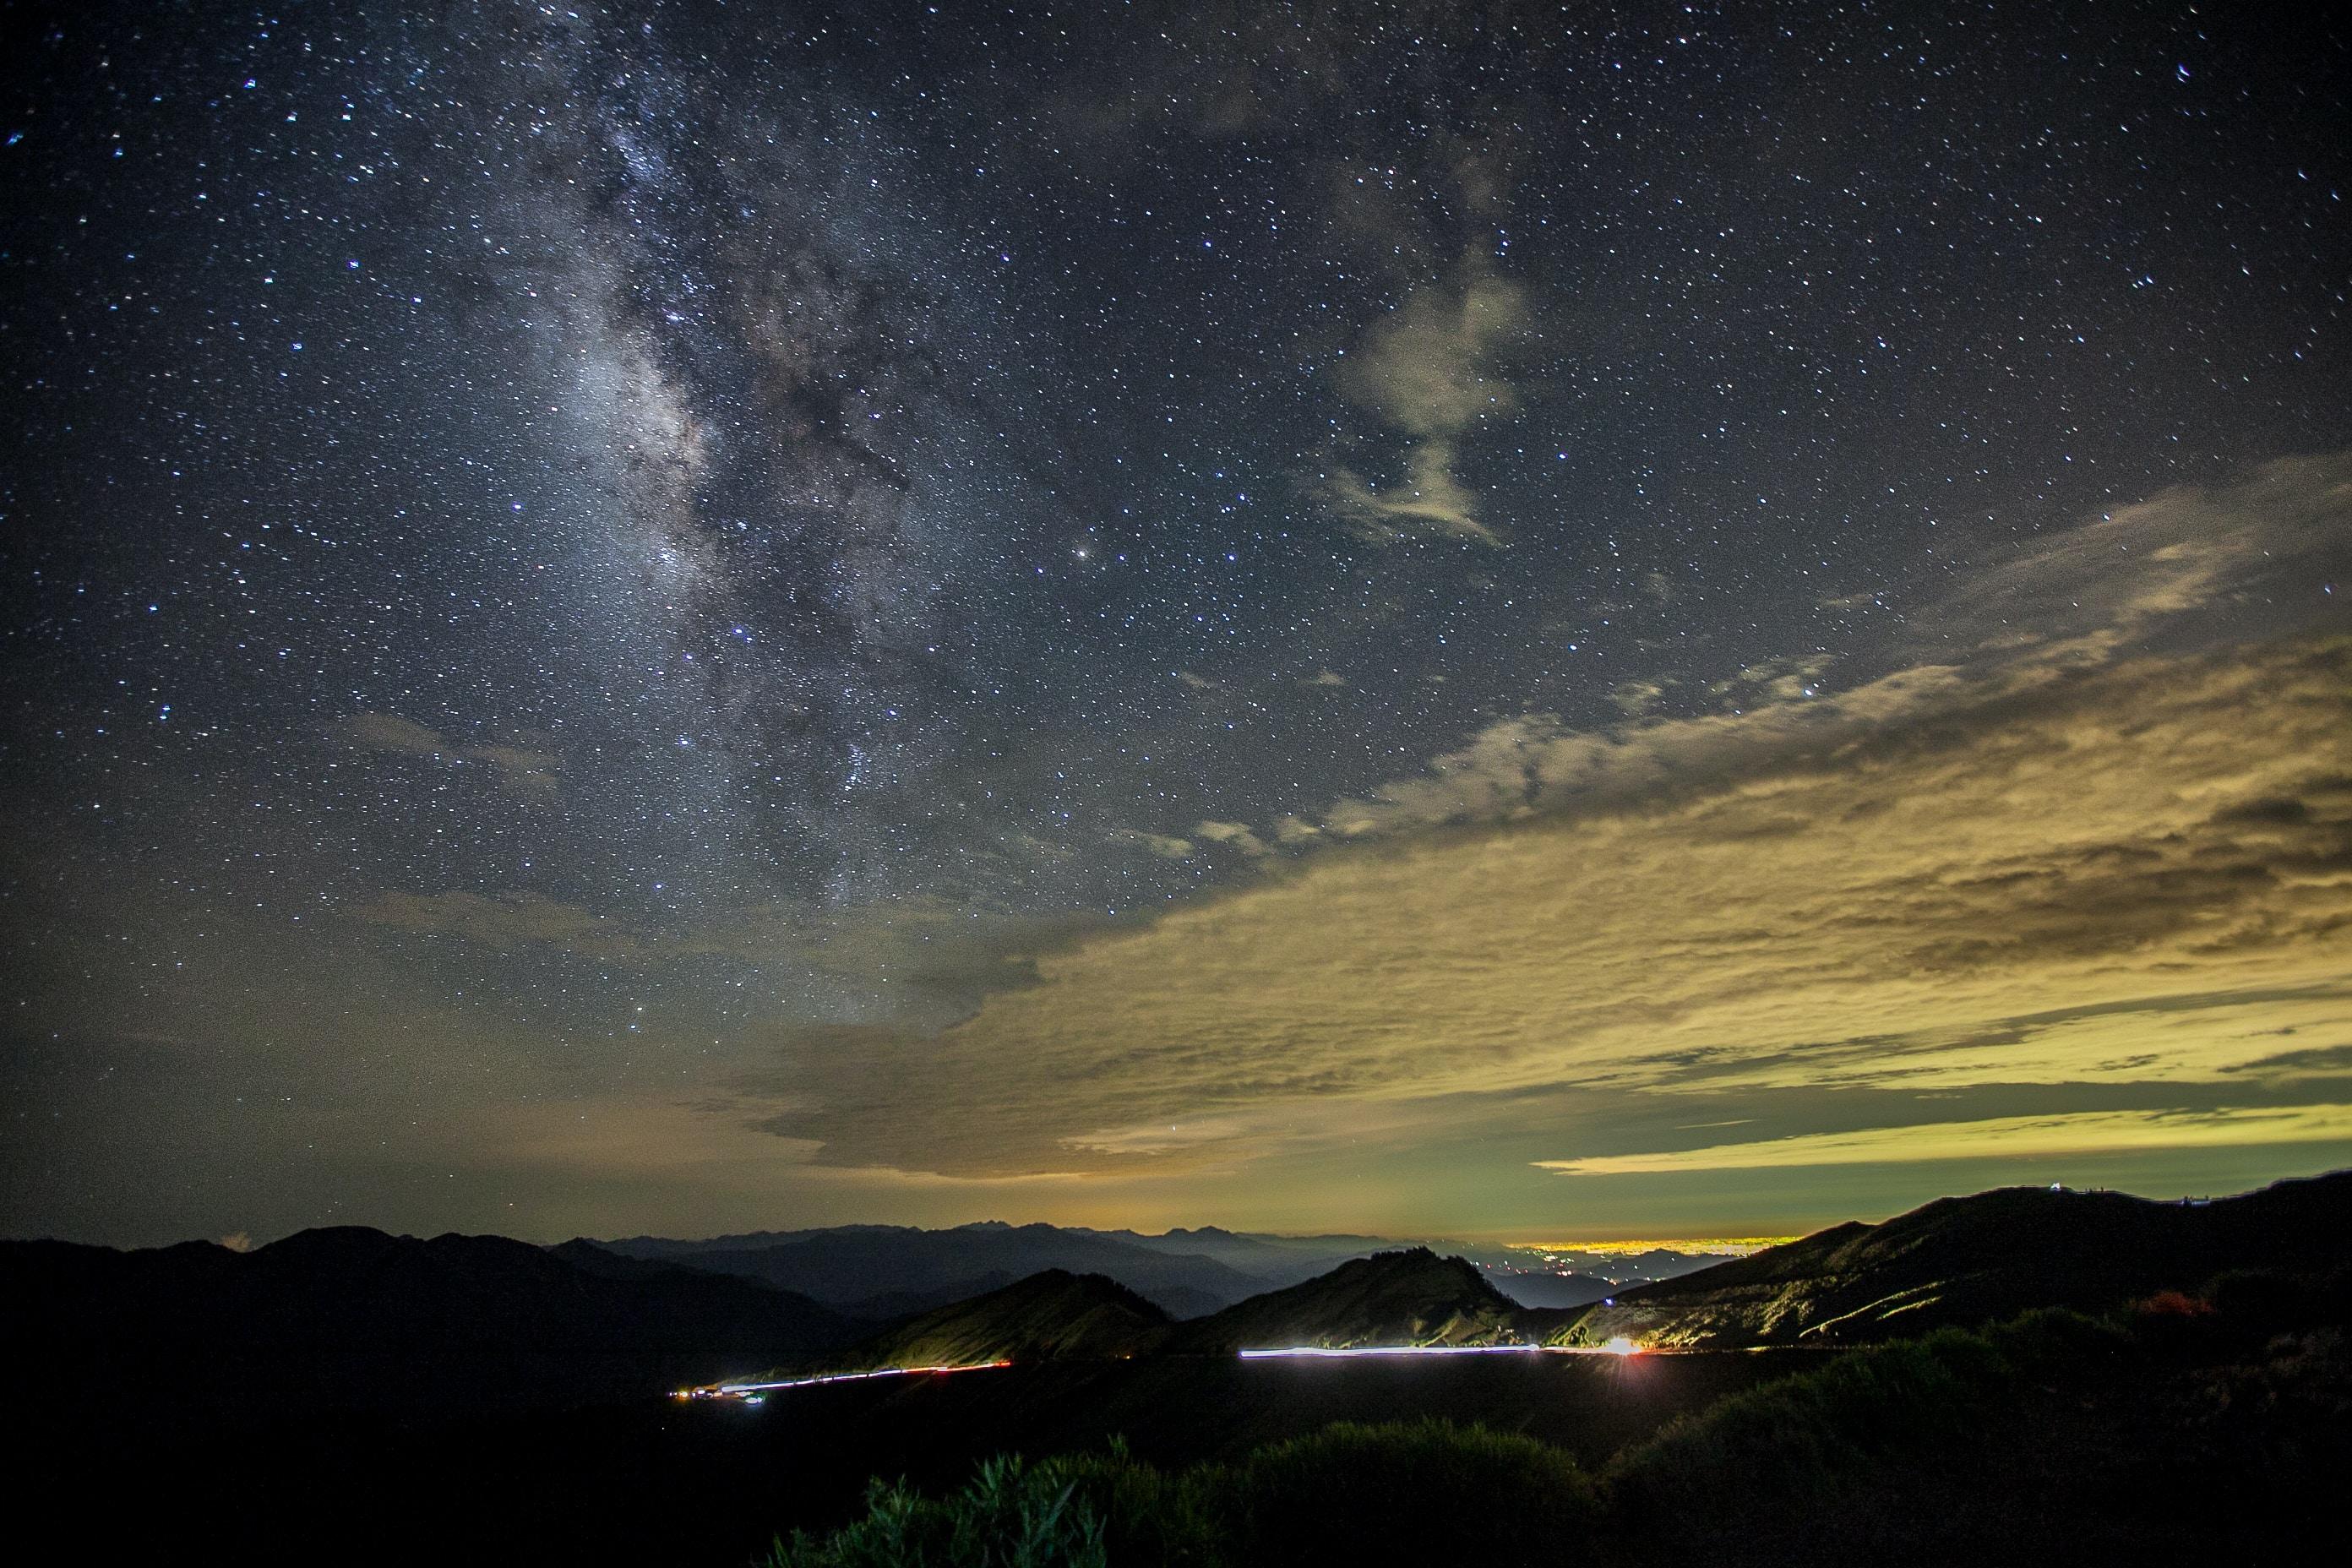 mountain range under Milky Way galaxy